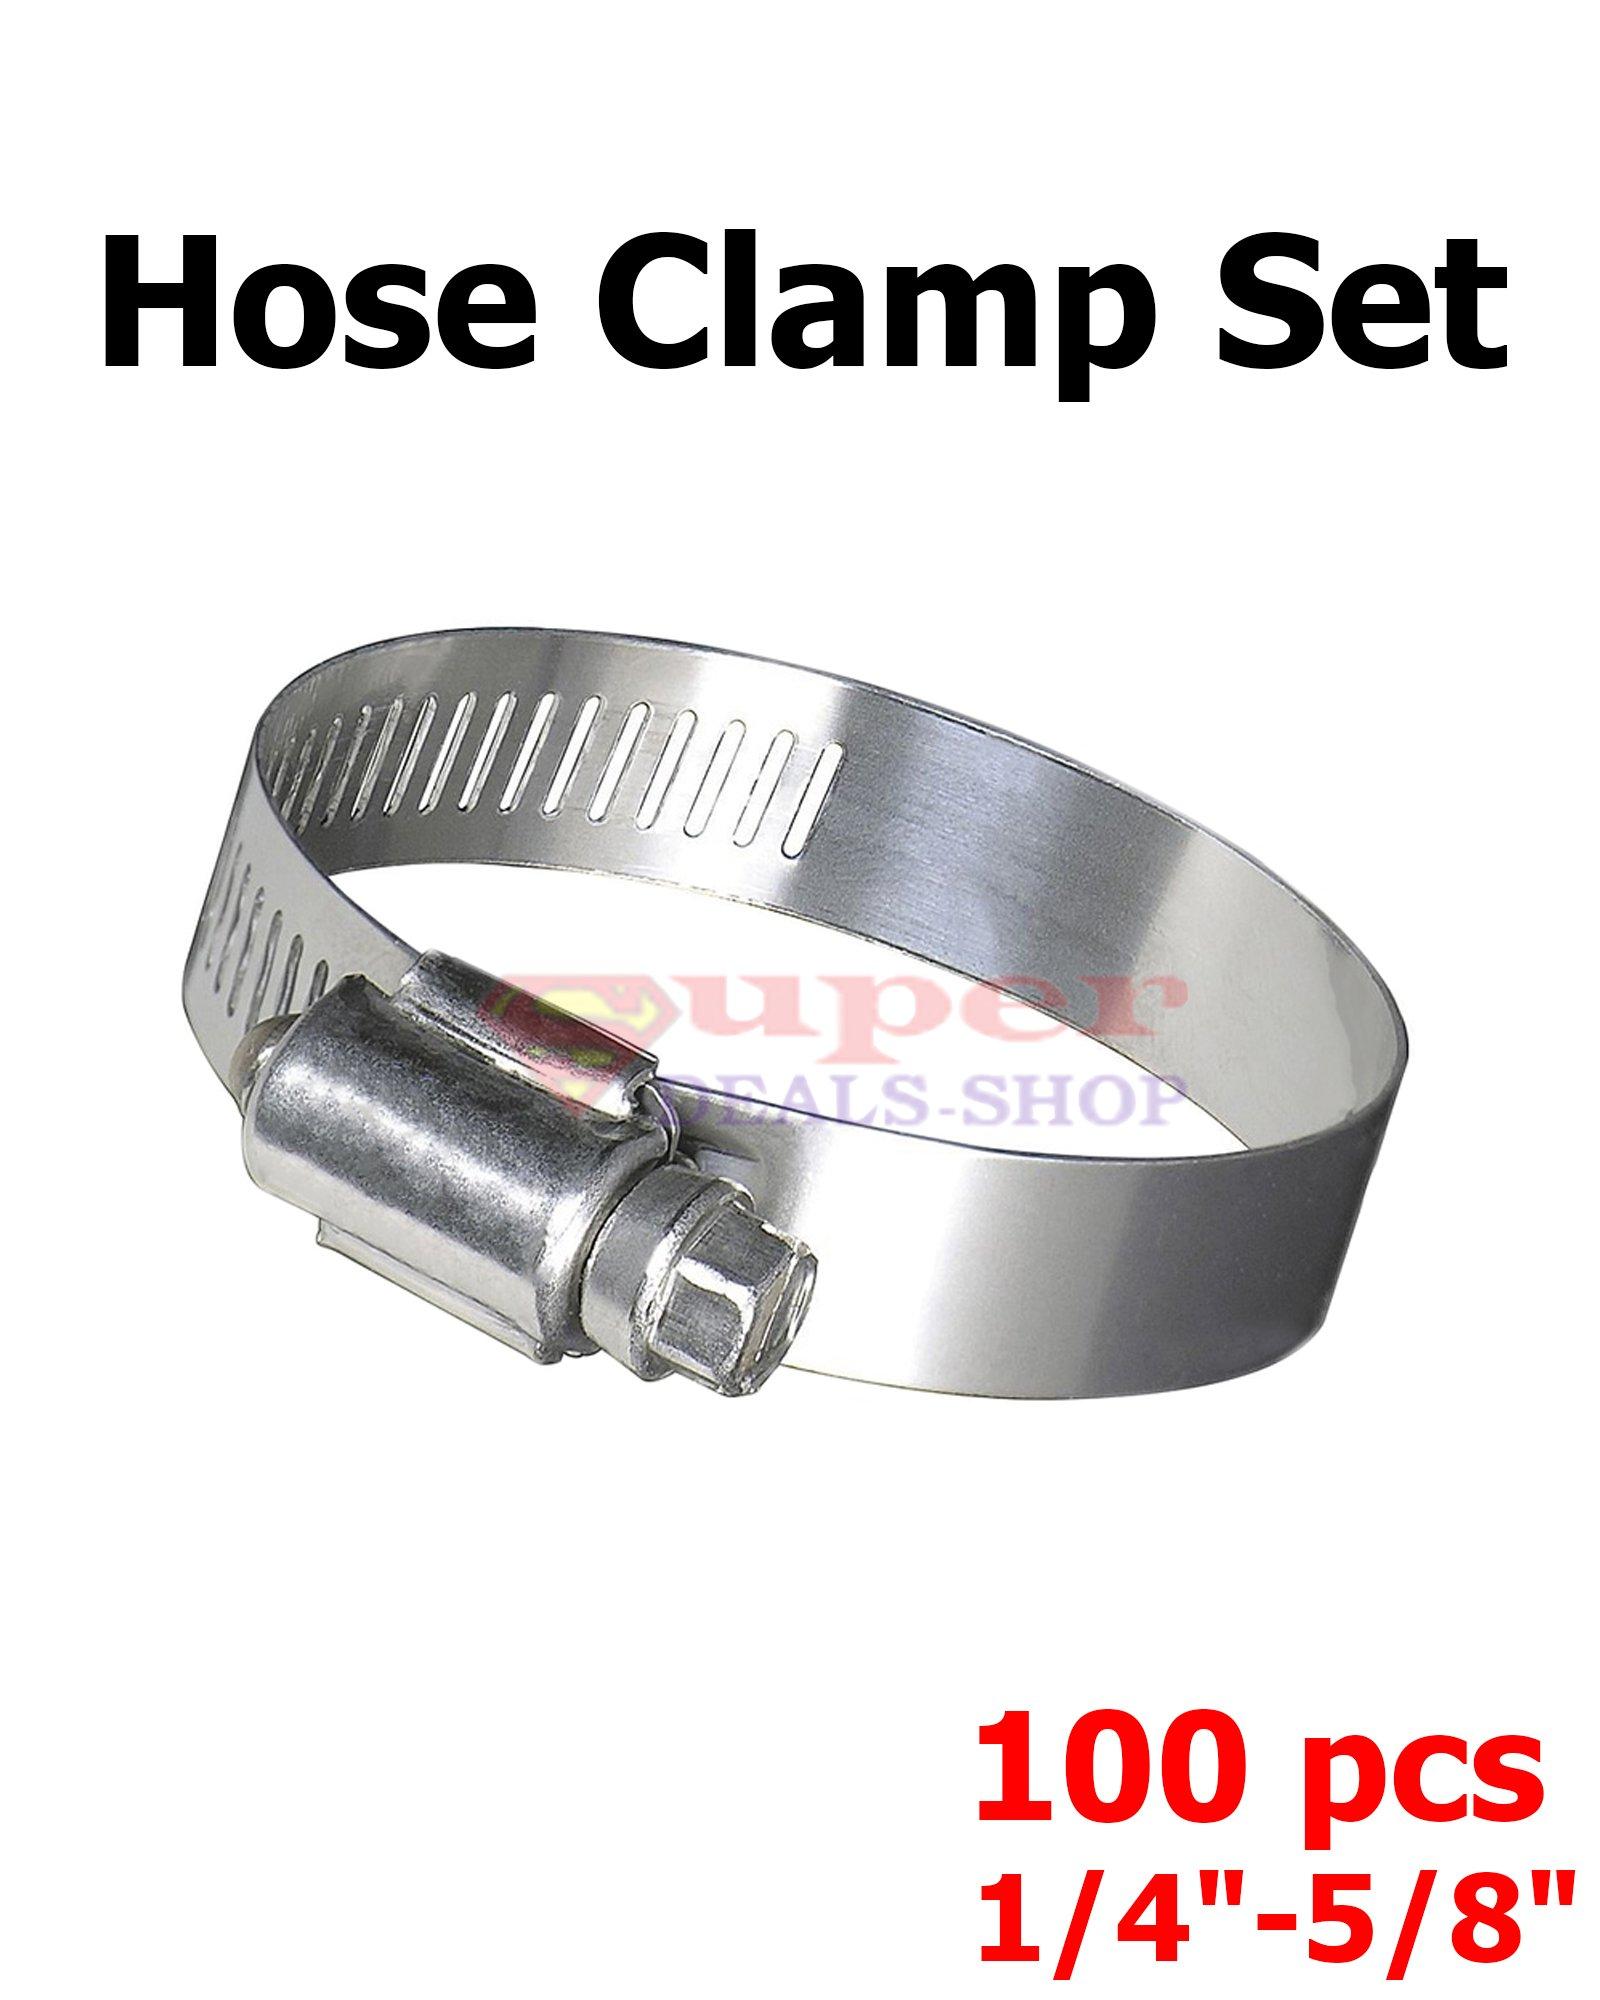 Steel Hose Clamp Radiator Hose Clamp Adjustable Stainless Steel Hose Clamp Super-Deals-Shop (100 1/4'' - 5/8'') by SDShop